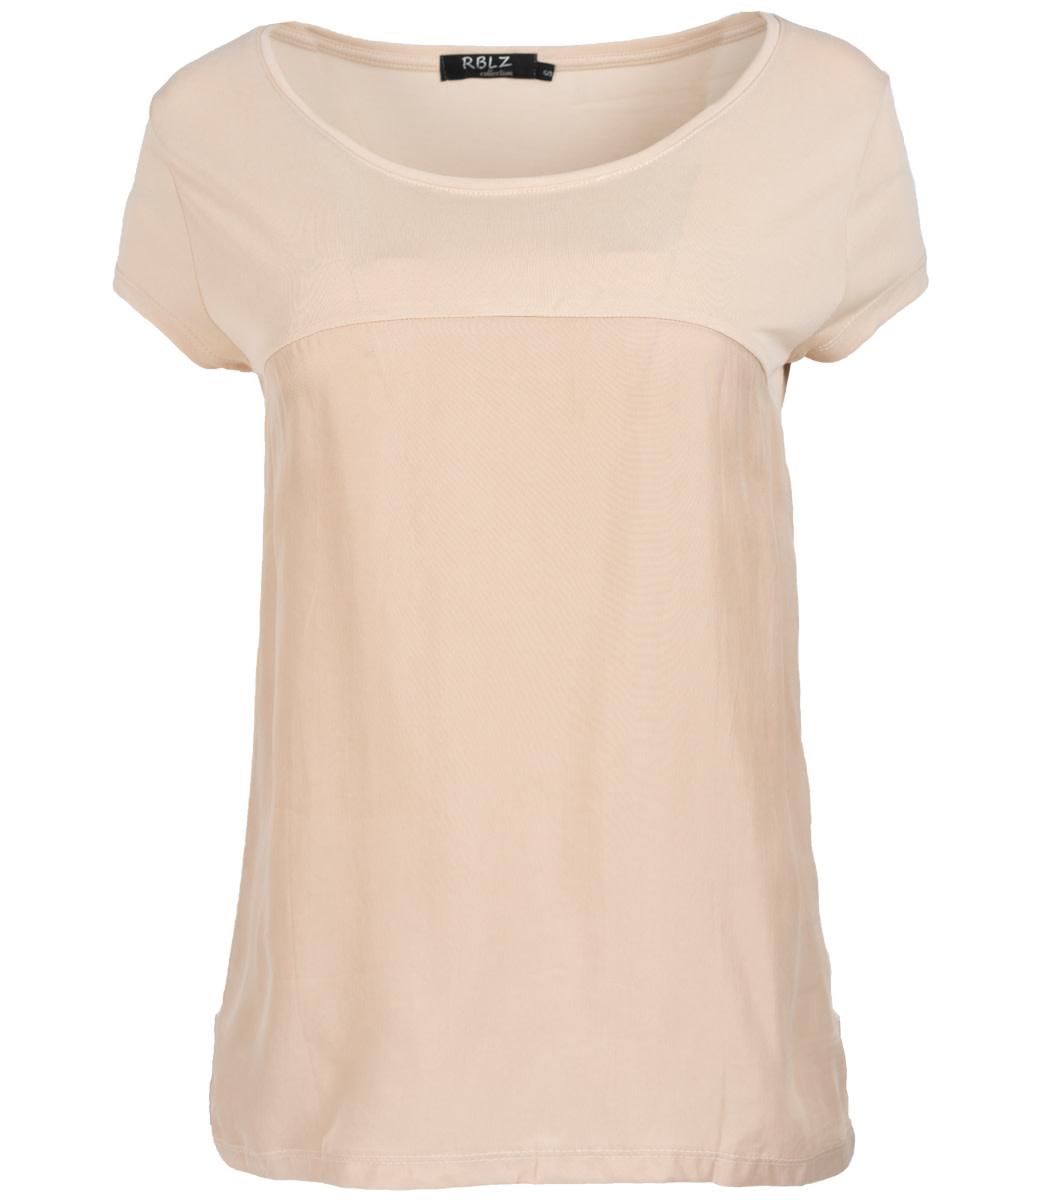 Rebelz Collection Shirt beige Ilse